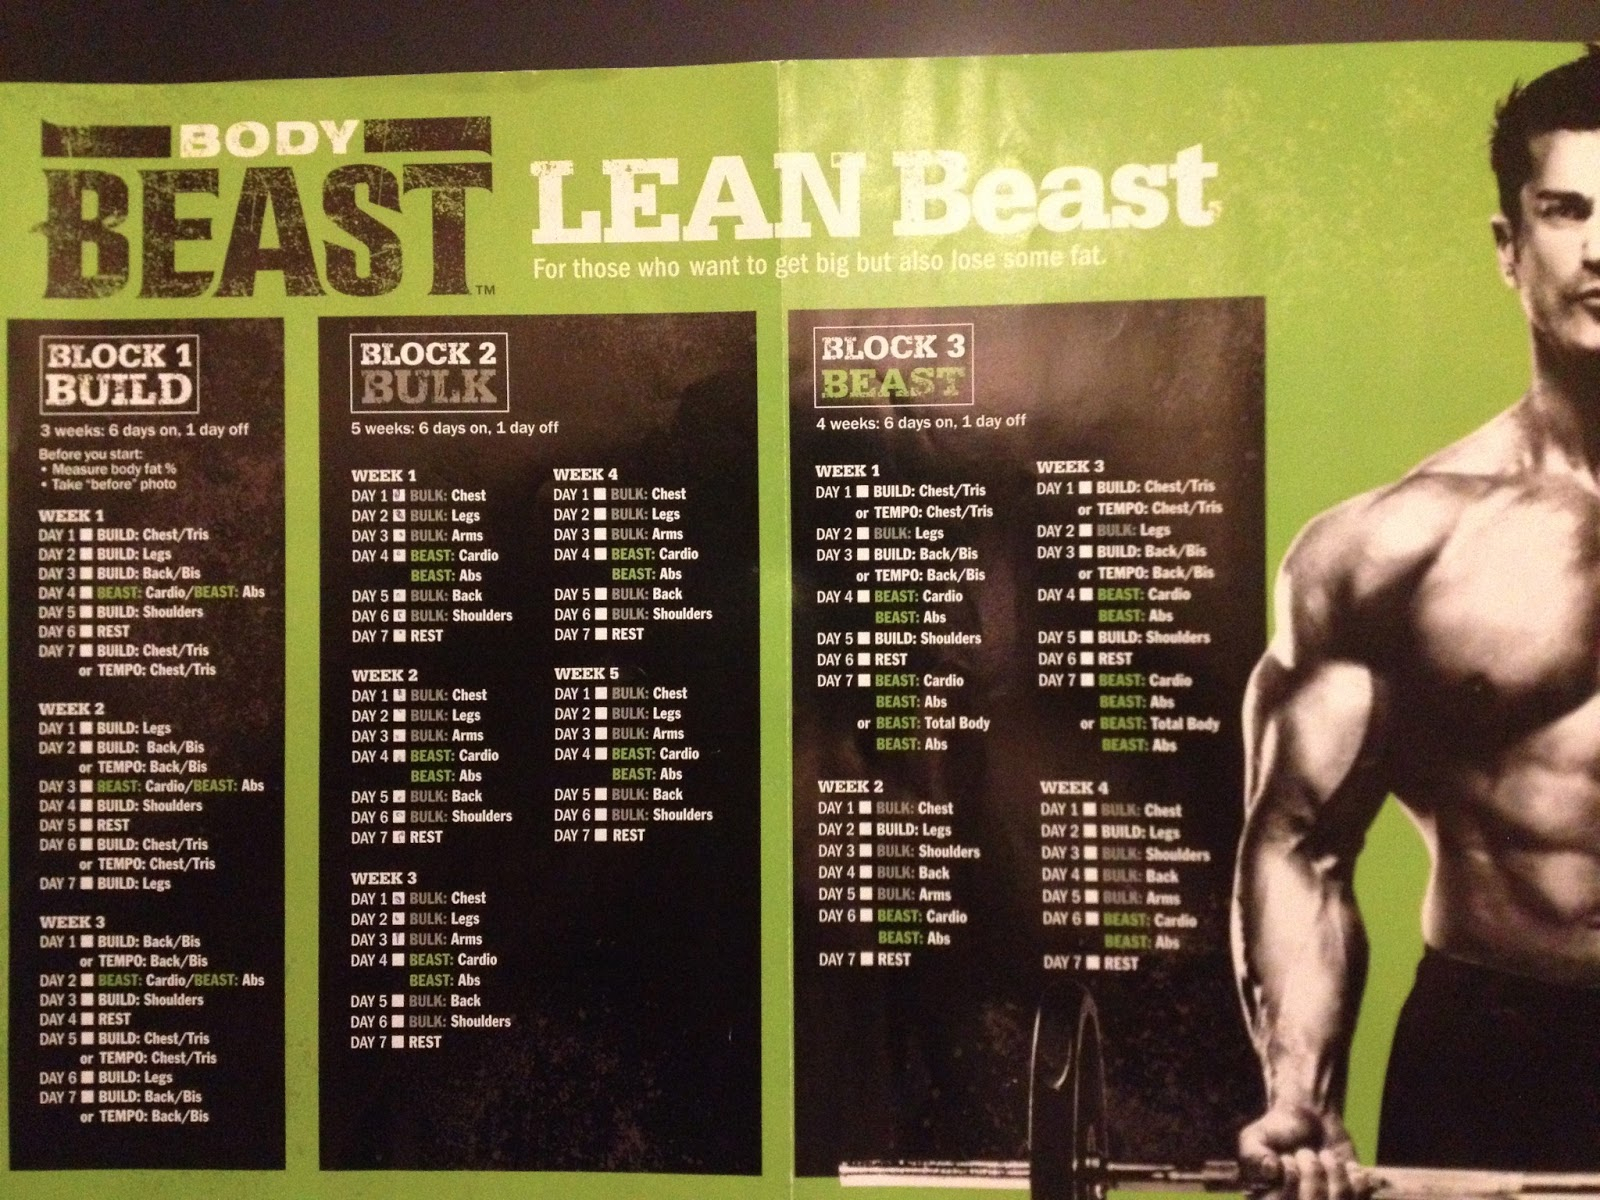 Week 1 Body Beastt25 Hybrid And Meal Plan | Melanie Mitro pertaining to Body Beast Max 30 Hybrid